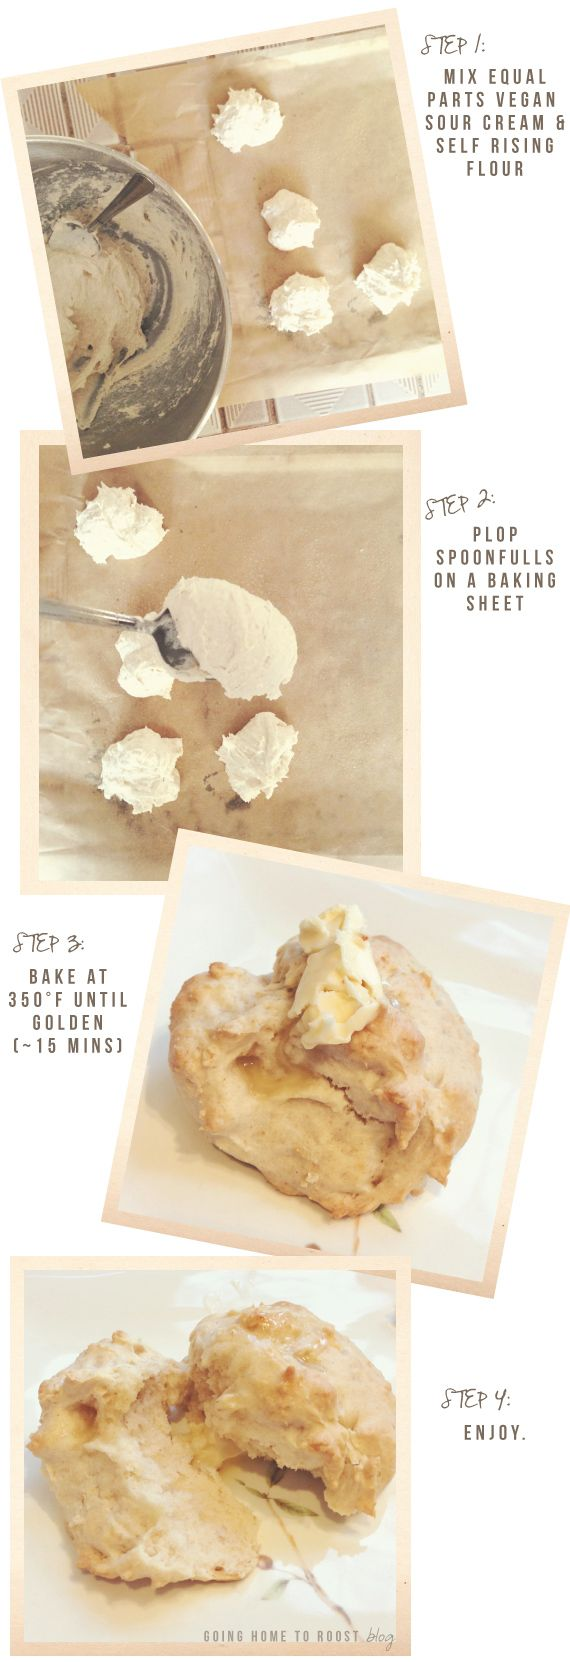 two-ingredient vegan biscuits